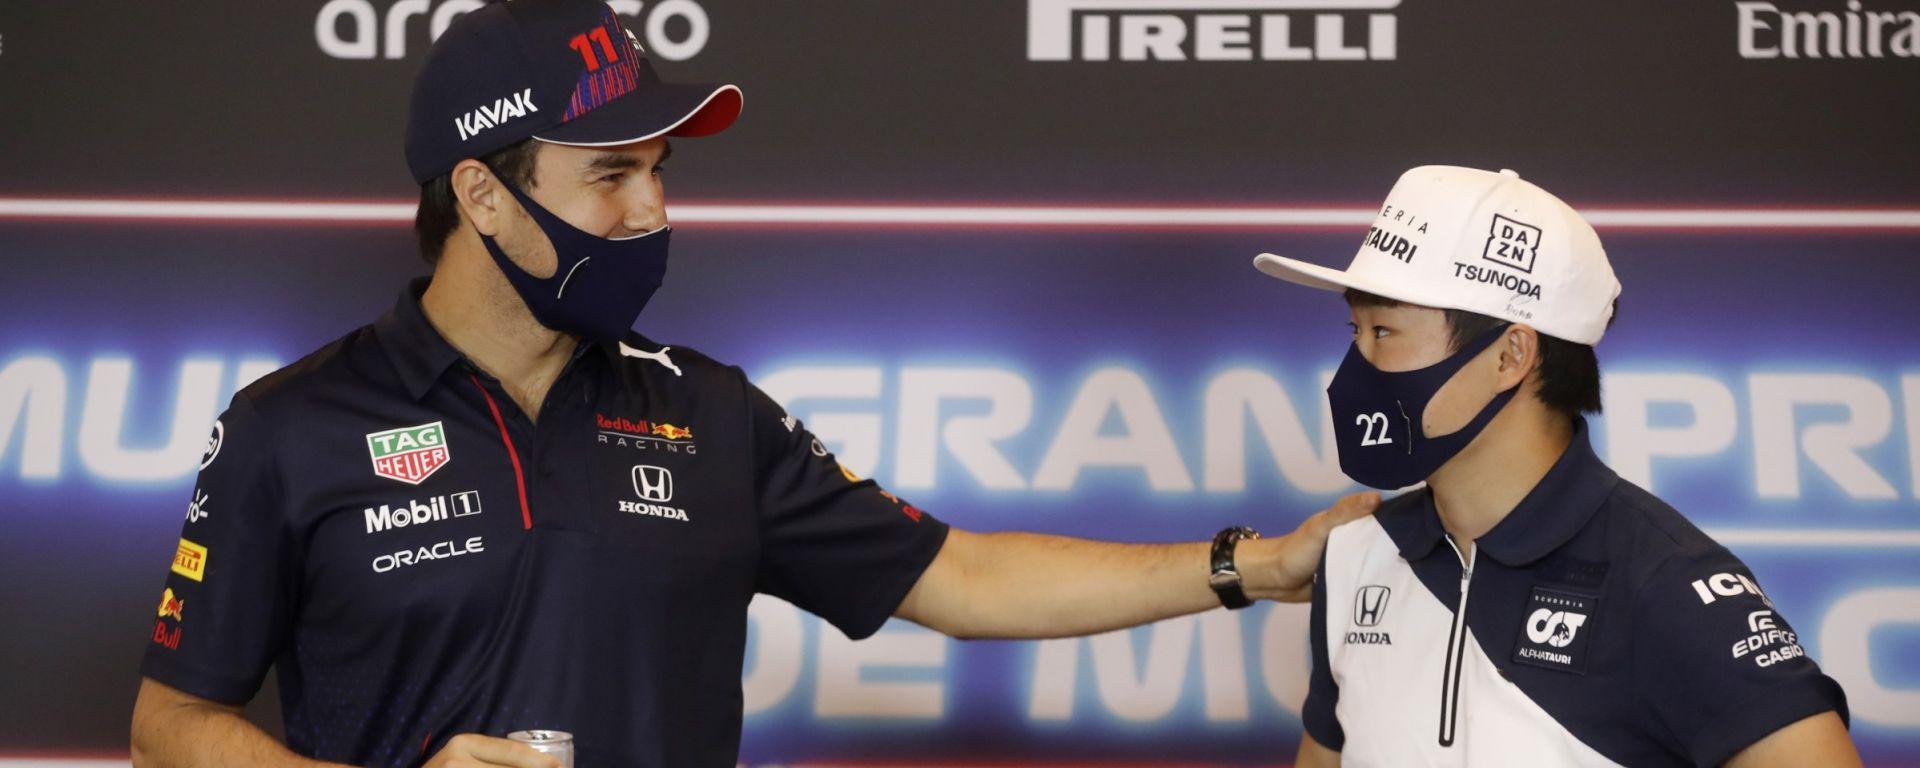 F1, GP Monaco 2021: Sergio Perez e Yuki Tsunoda